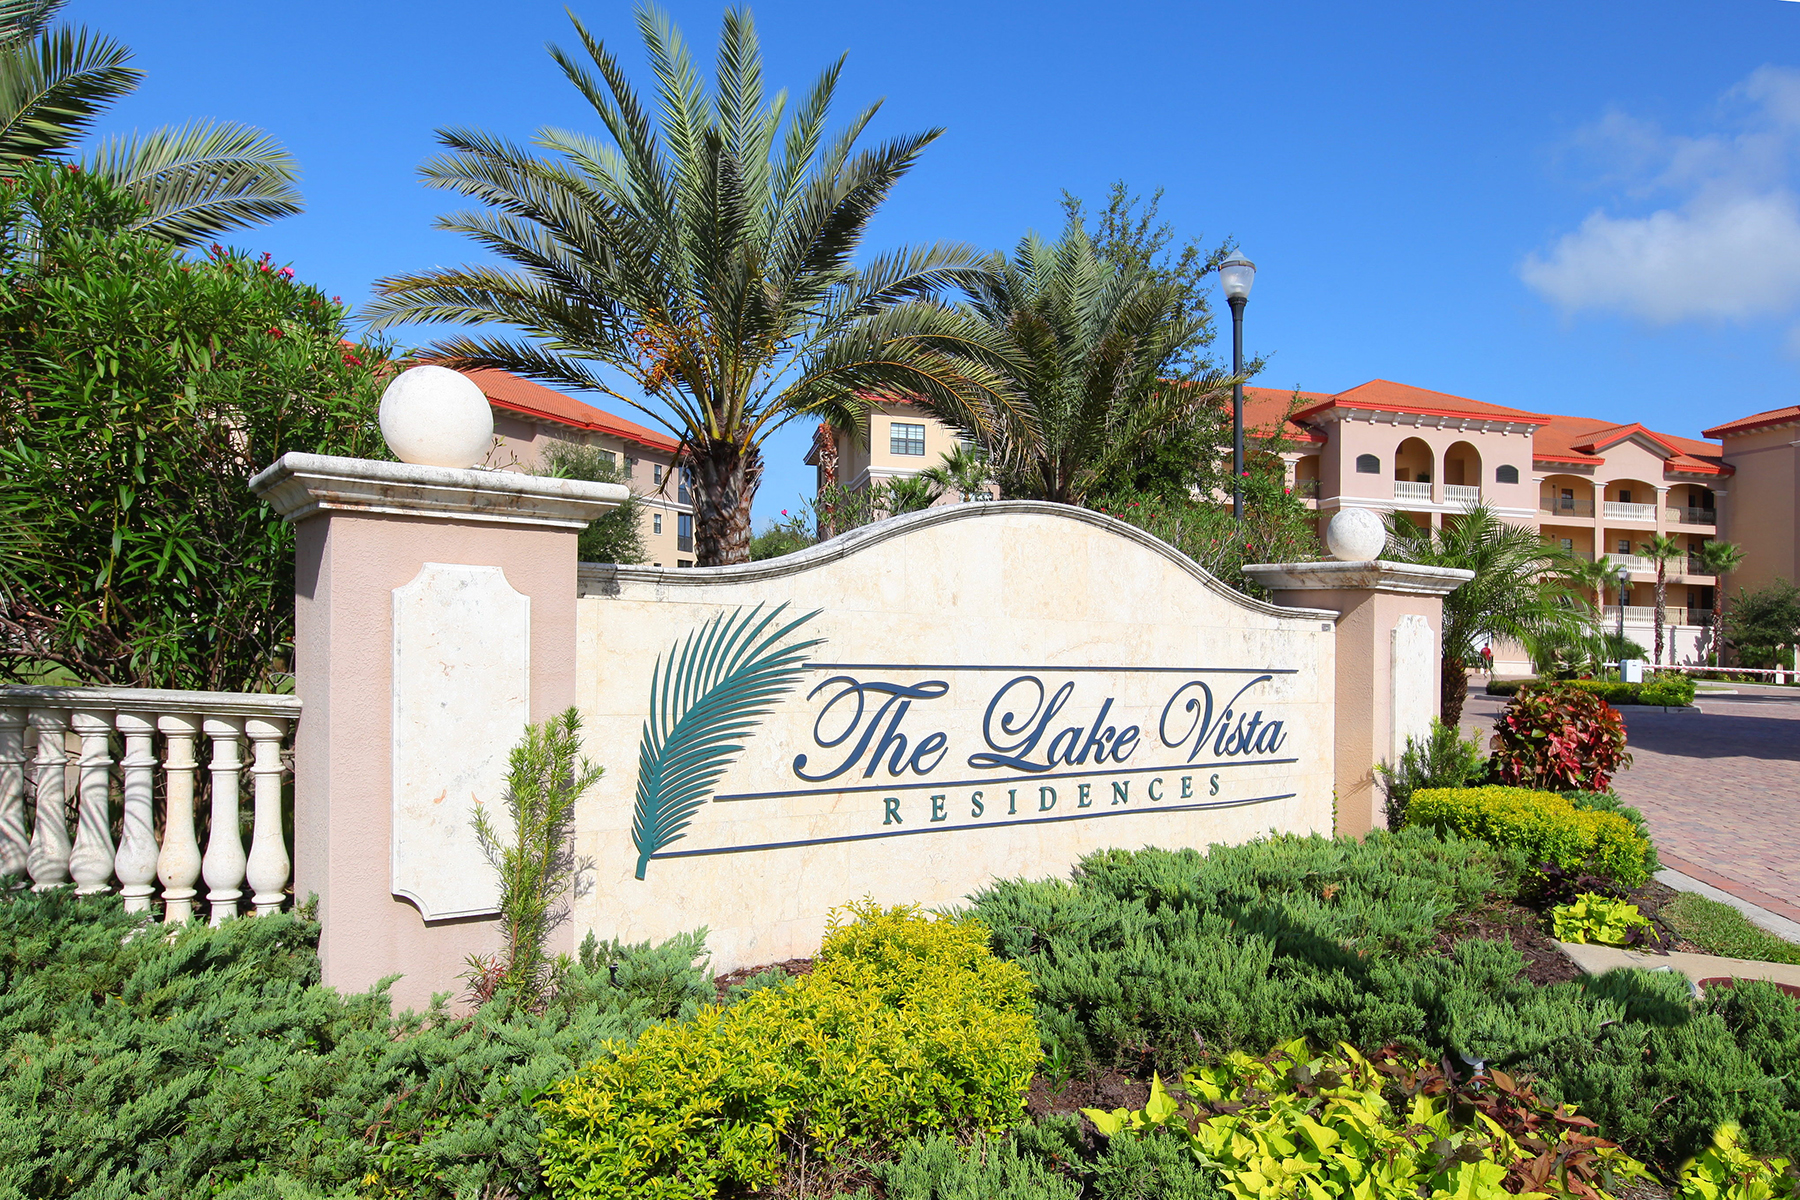 Condominium for Sale at LAKE VISTA 7702 Lake Vista Ct 305 Lakewood Ranch, Florida 34202 United States